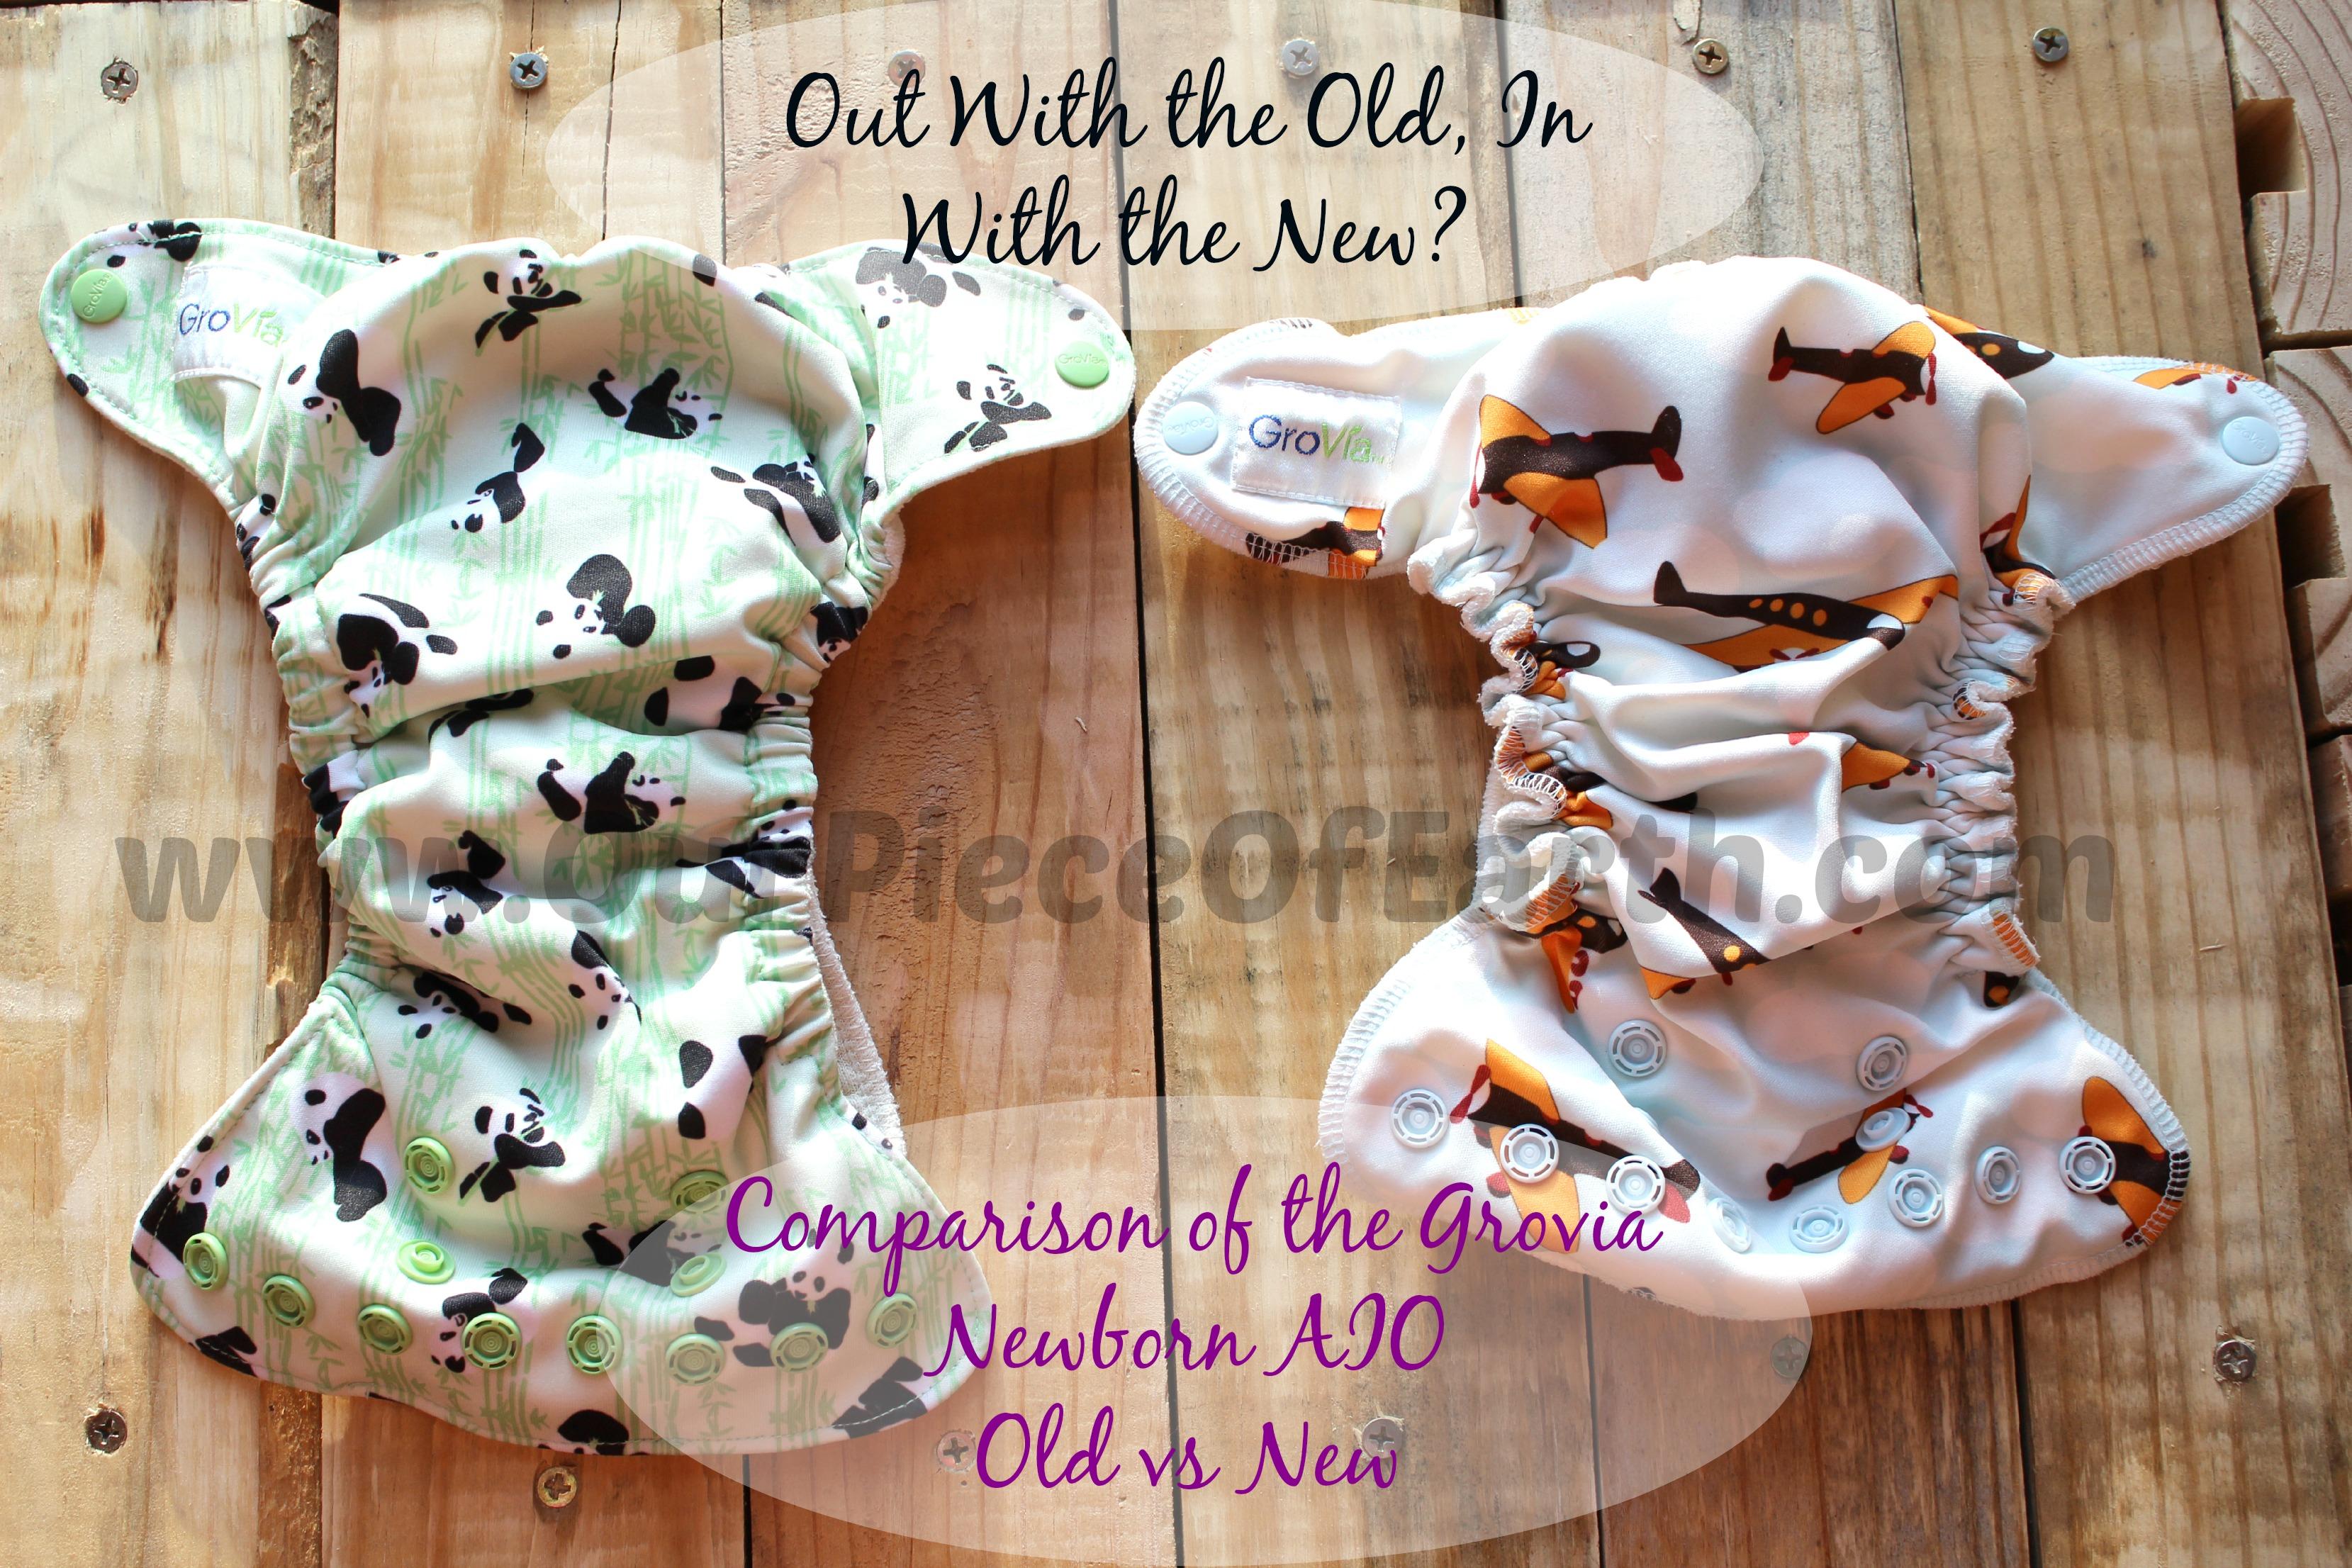 Are Grovia newborn AIO cloth diapers good?